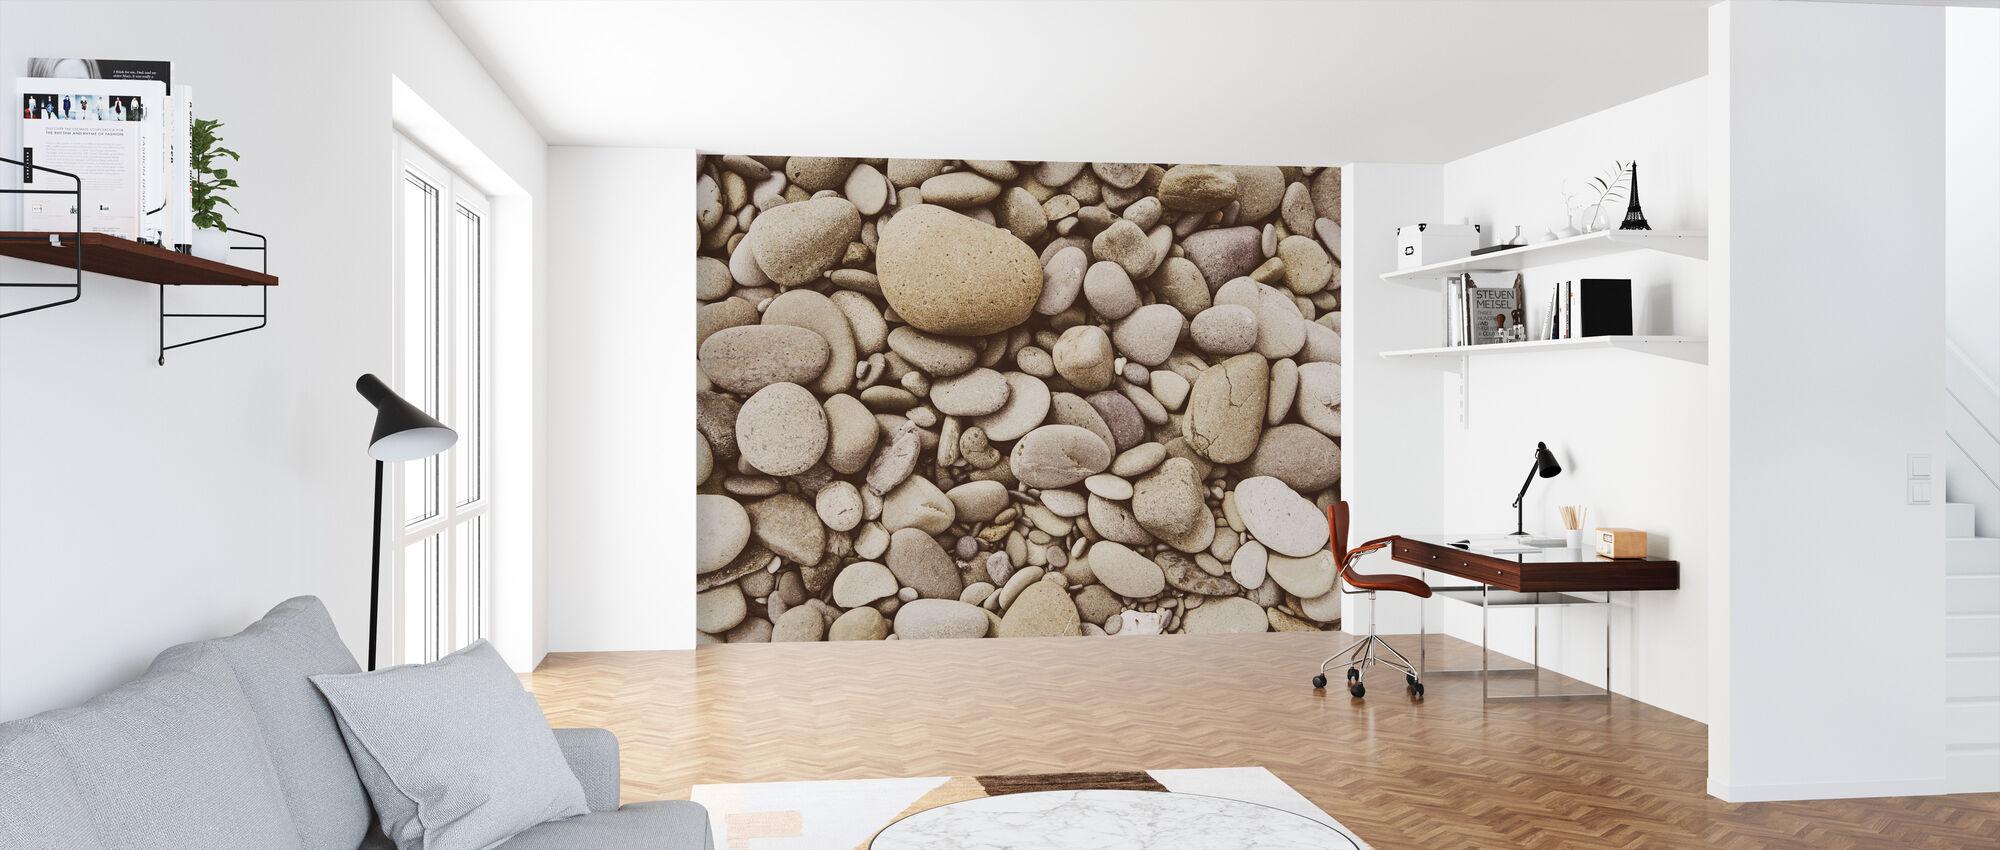 Polished Pebble - Wallpaper - Office